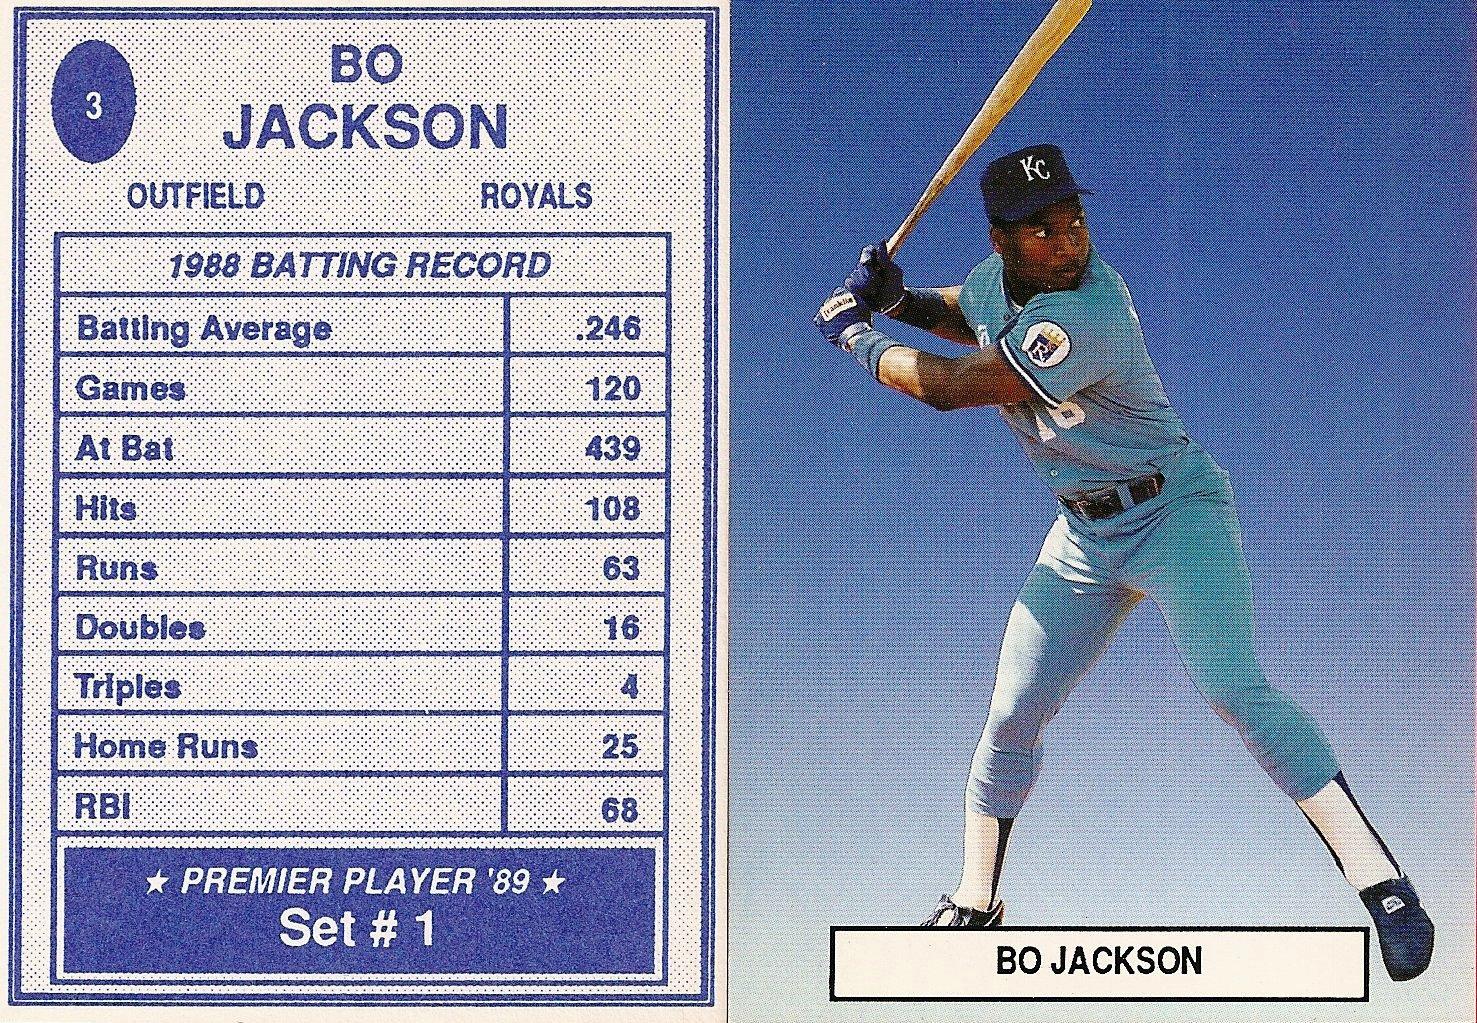 1989 Premier Player Set #1 (blue background)